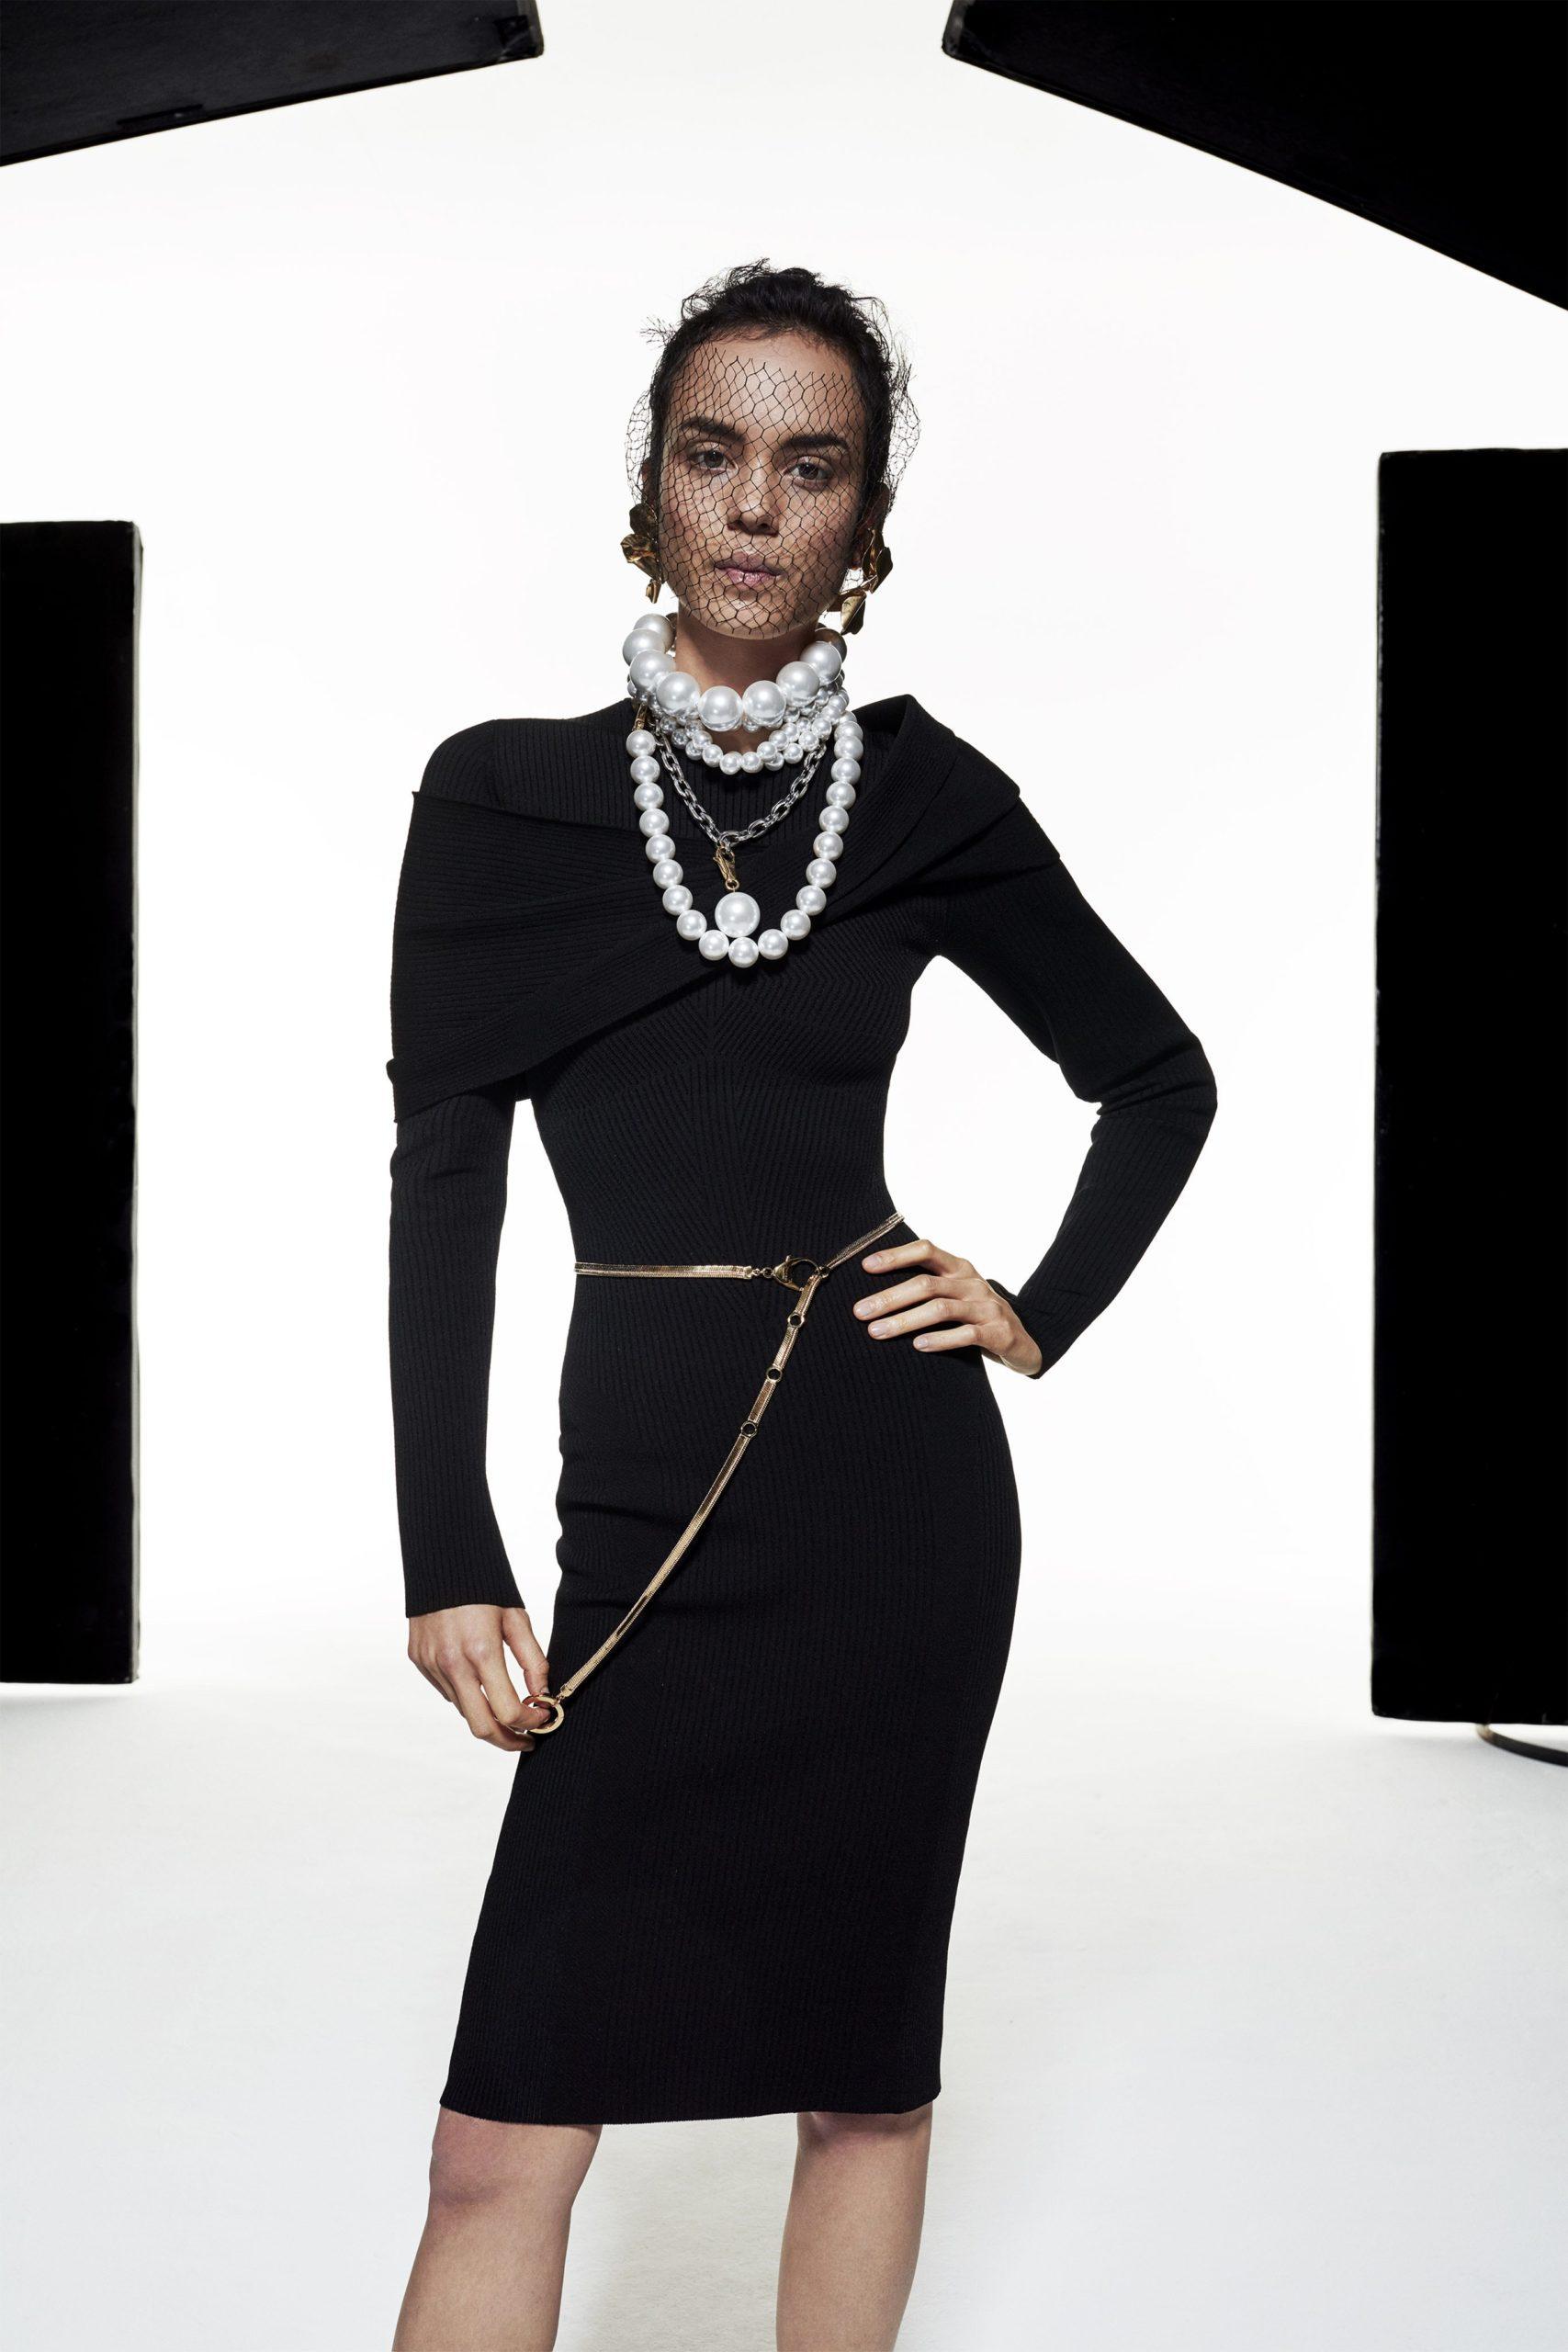 Alber Elbaz - AZ Factory - Haute Couture Spring Summer 2021 by RUNWAY MAGAZINE